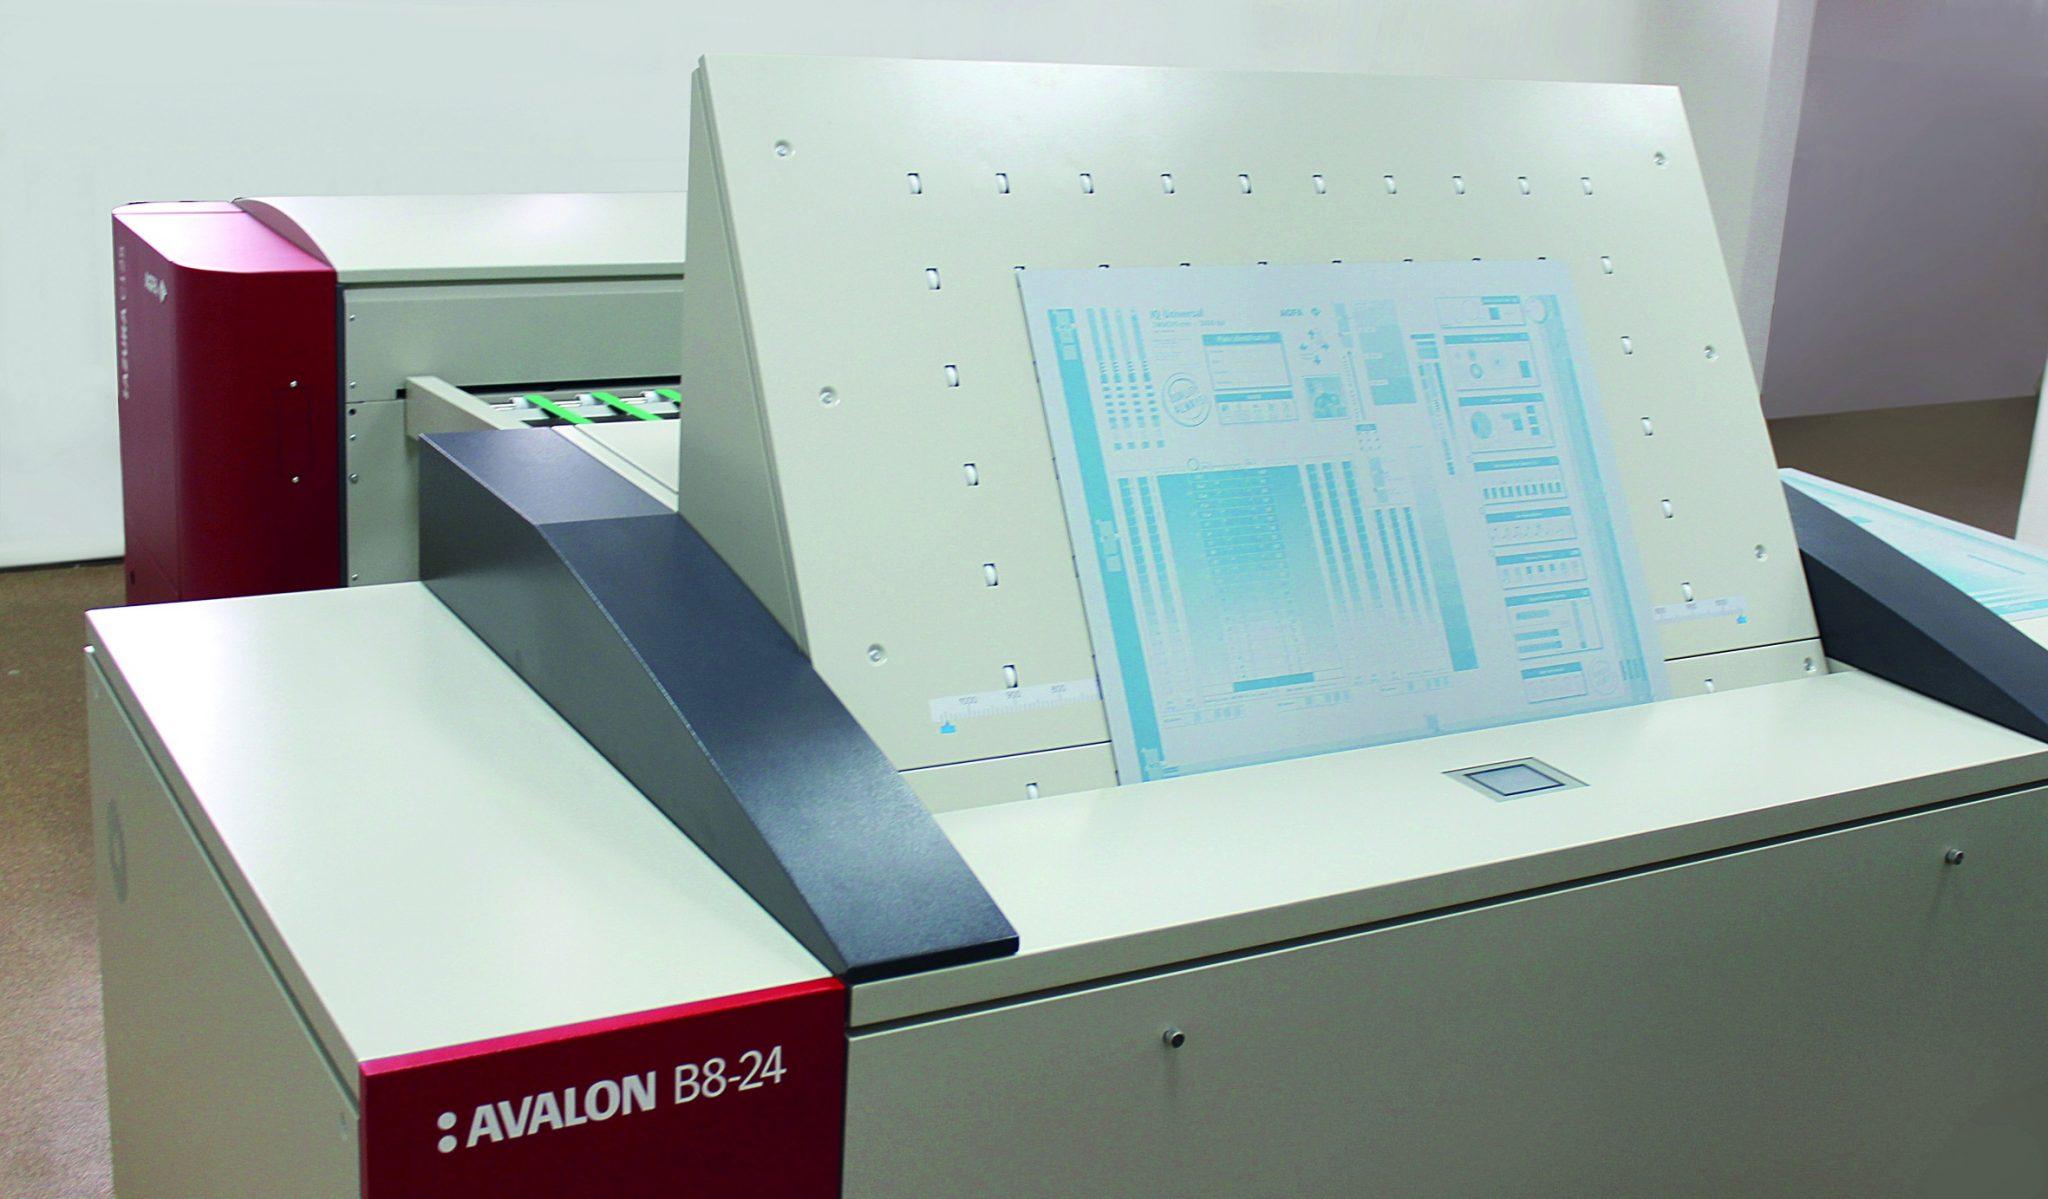 Avalon-B8-24